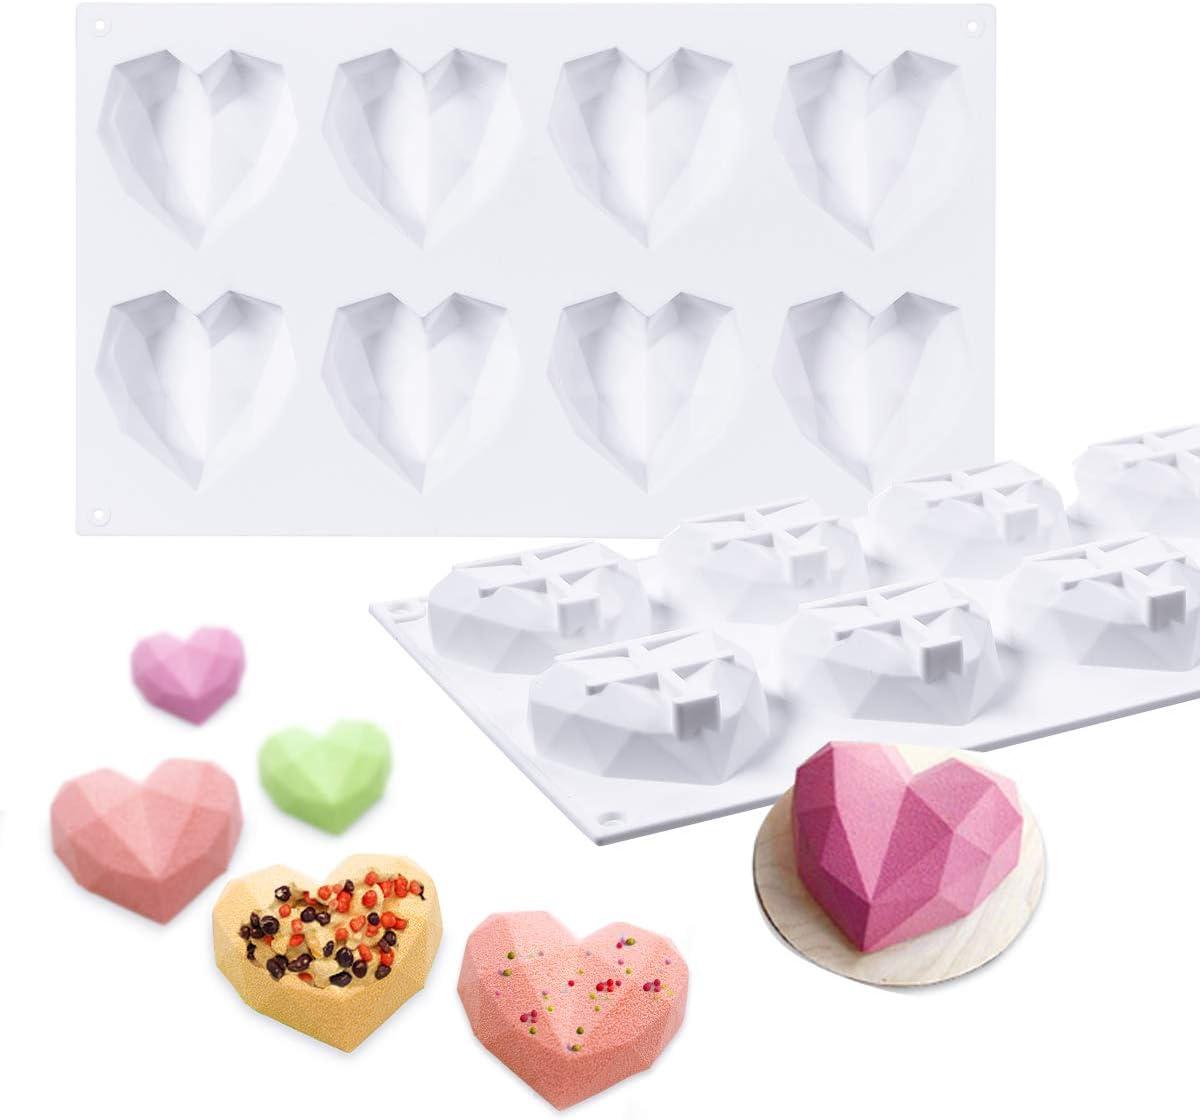 Cake Hearts Cake Gems Diamond Heart 3D Cakesicle Silicone Mould